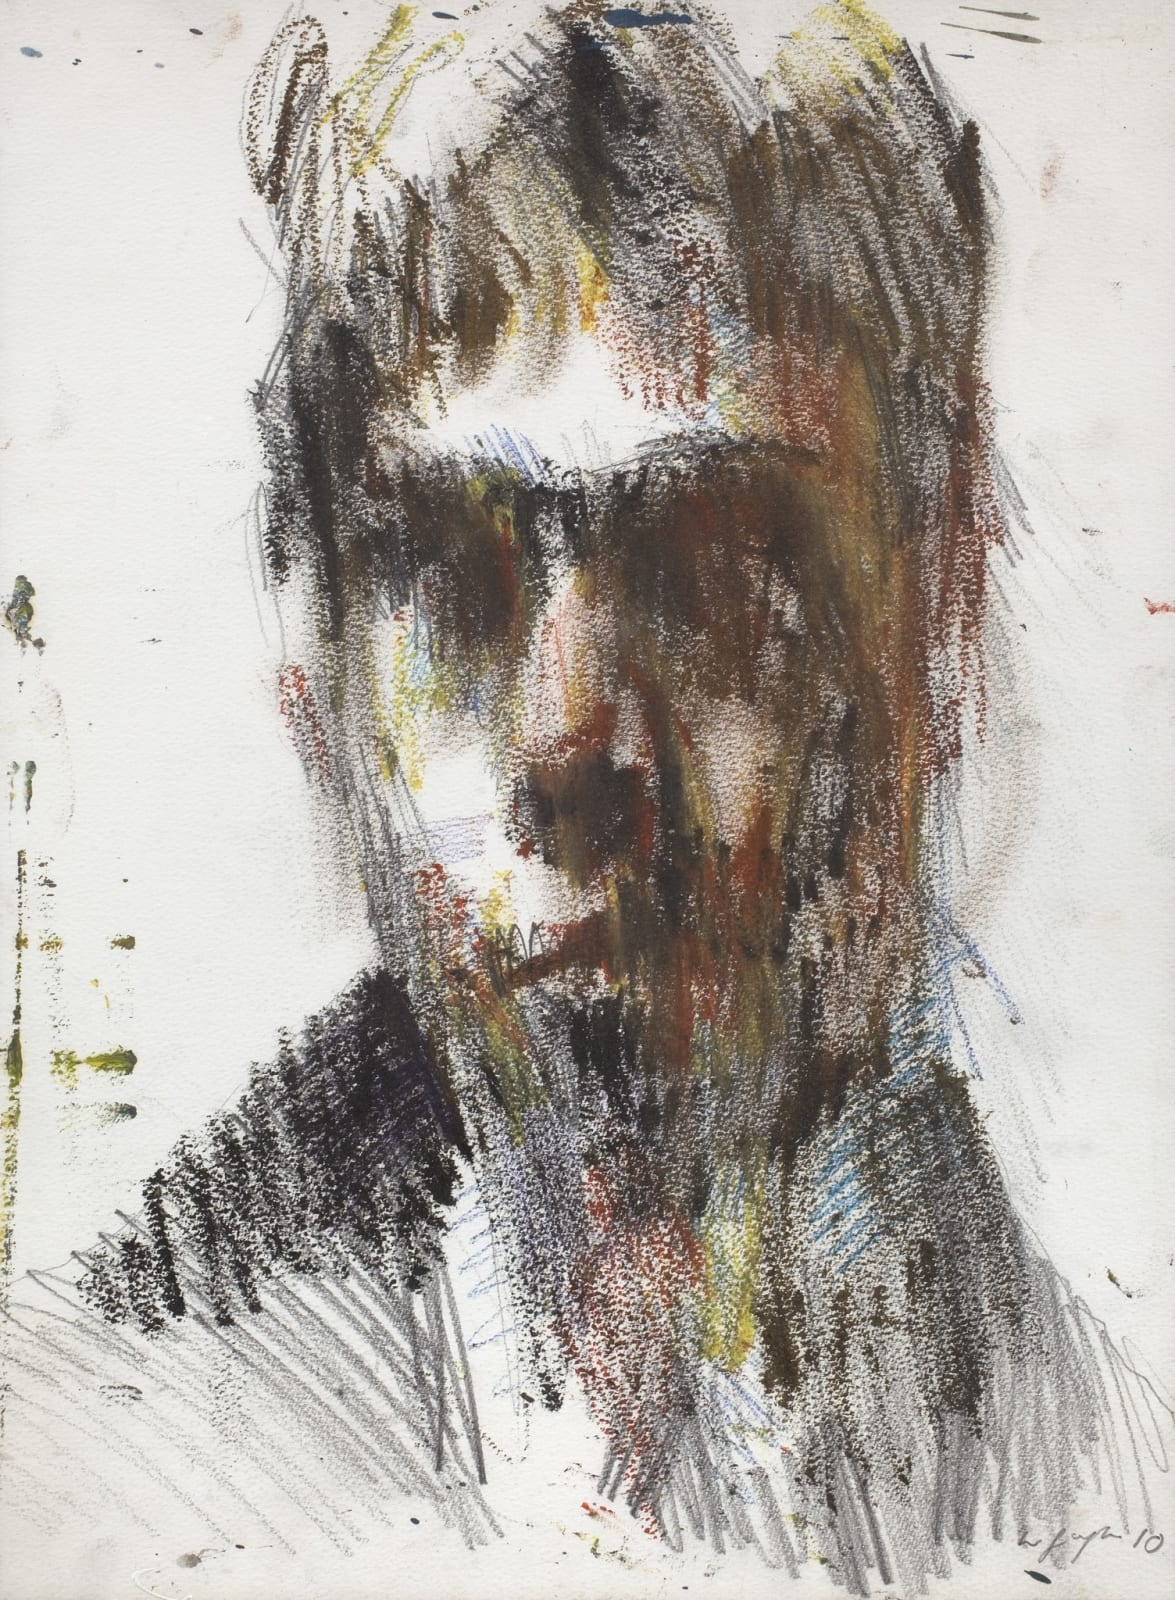 William Foyle, Self-Portrait, 2010